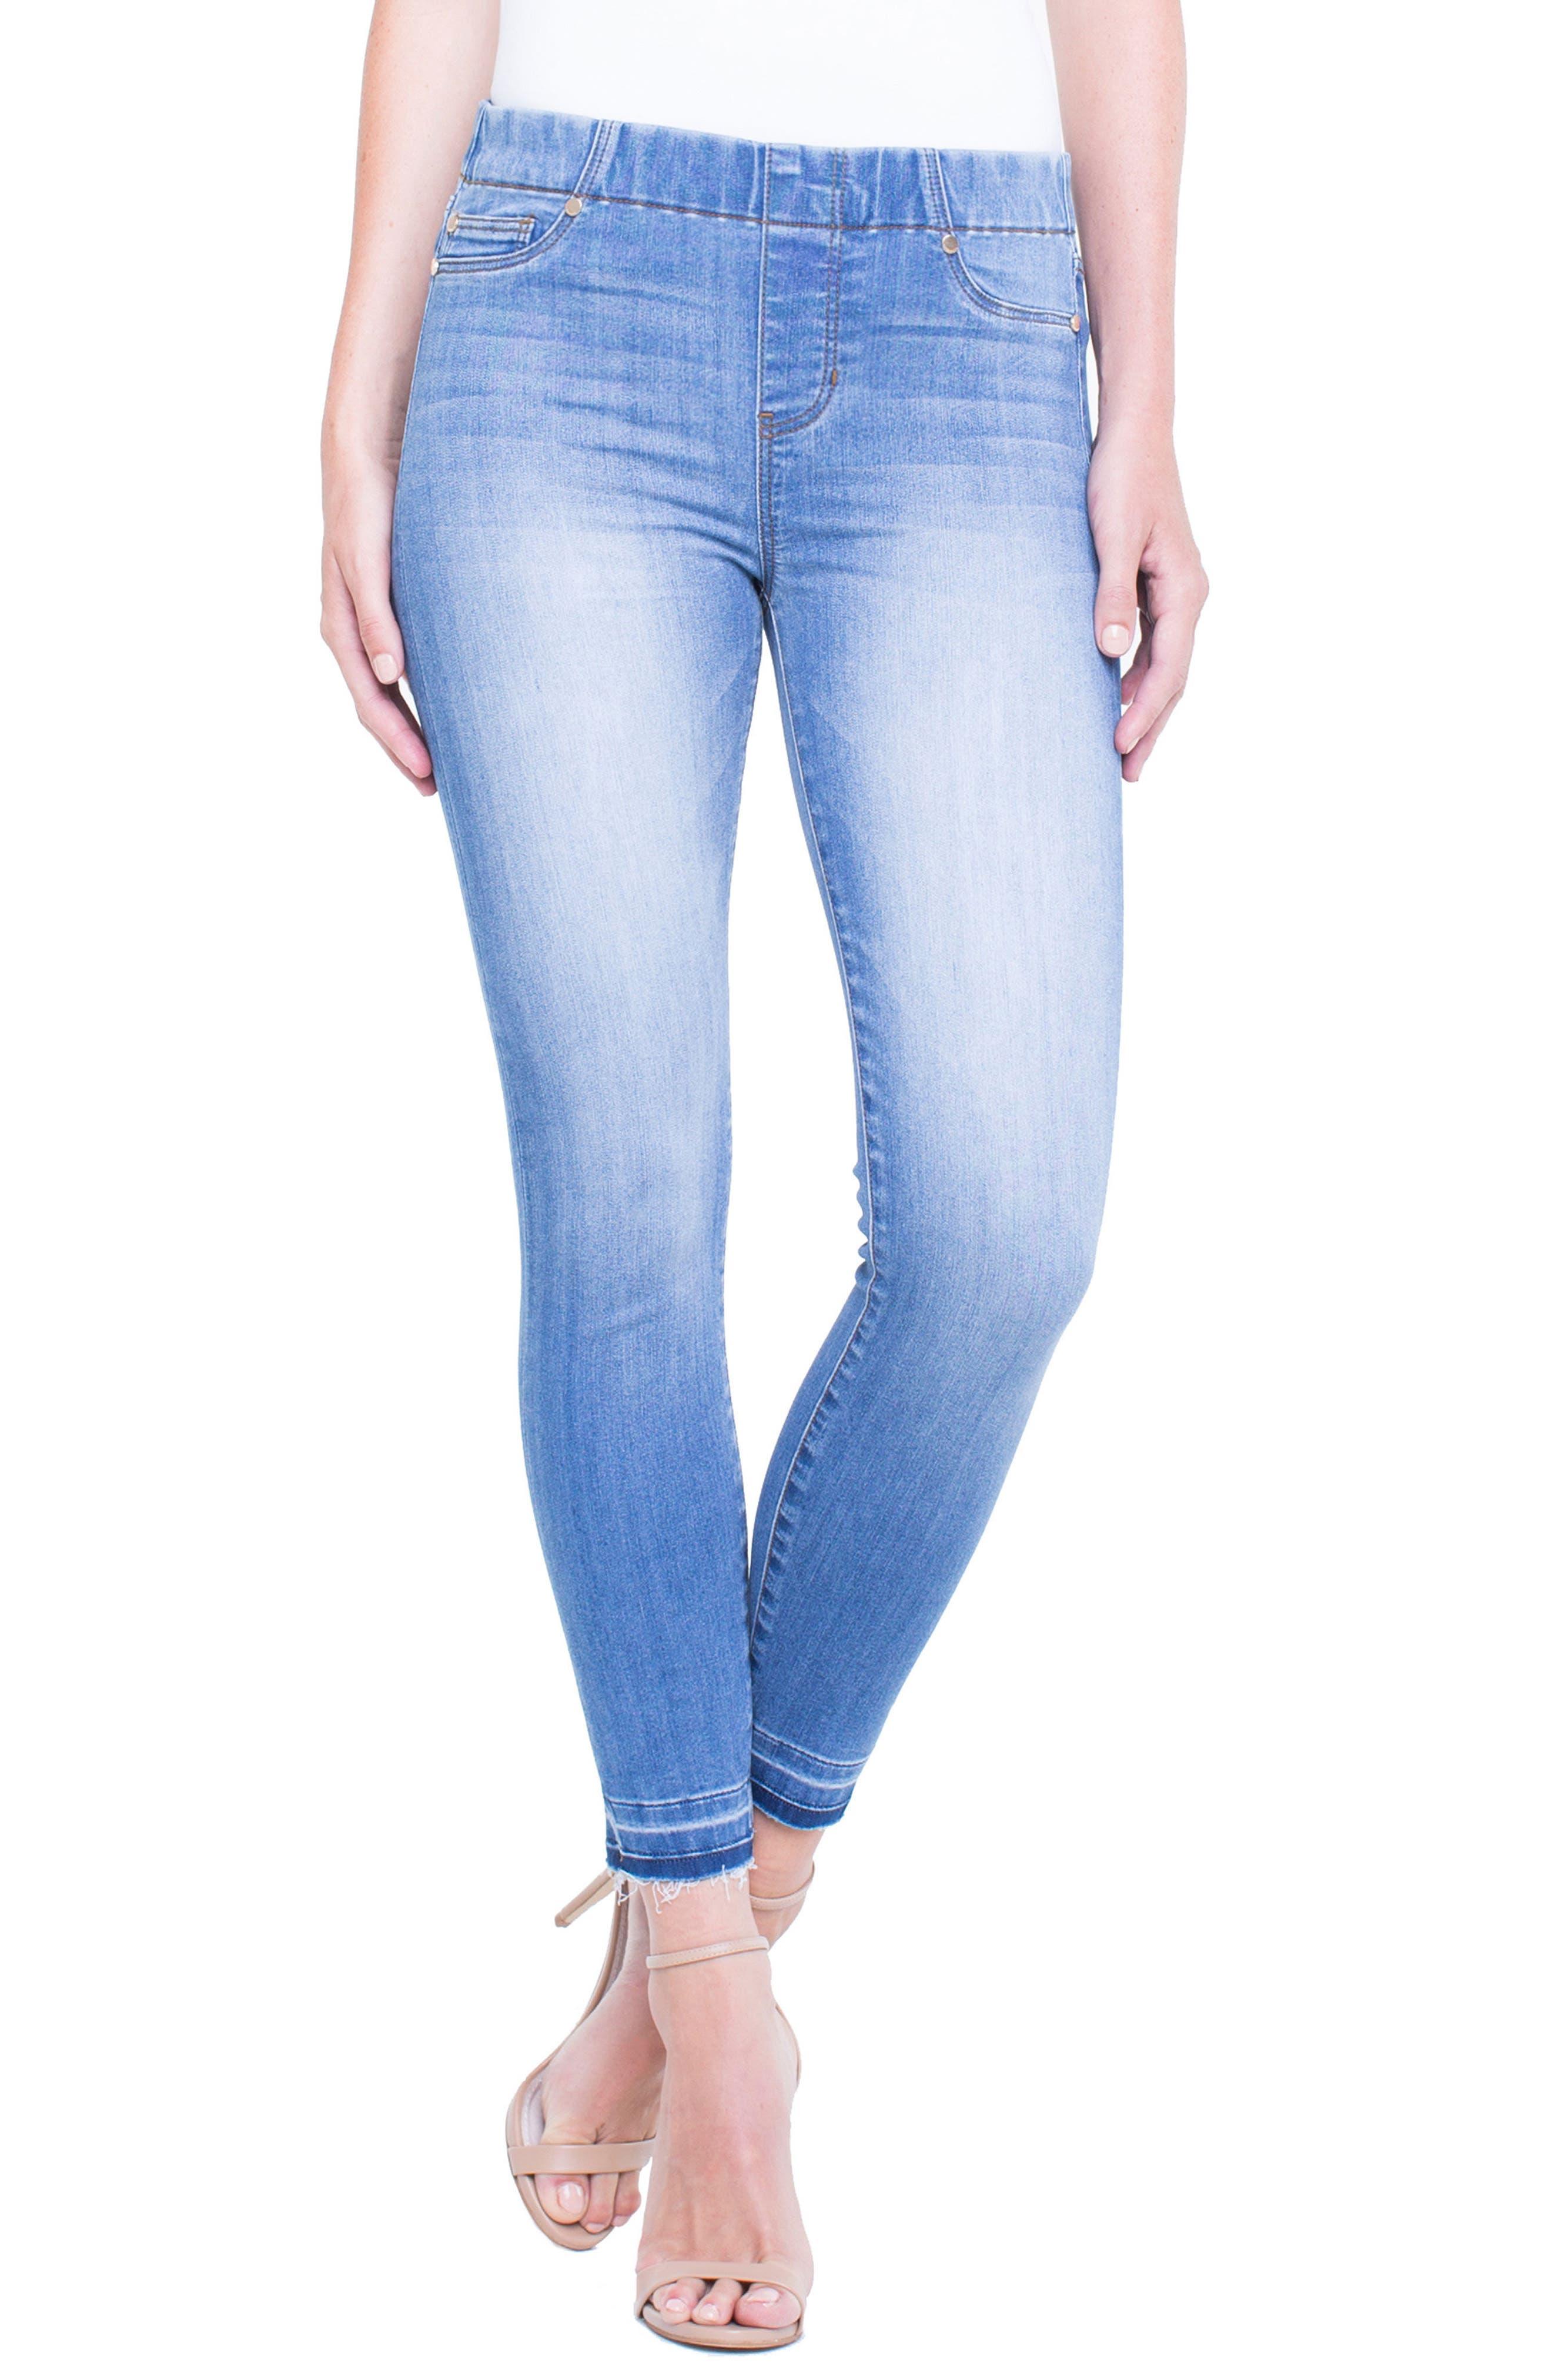 Liverpool Jeans Company Chloe Release Hem Denim Leggings